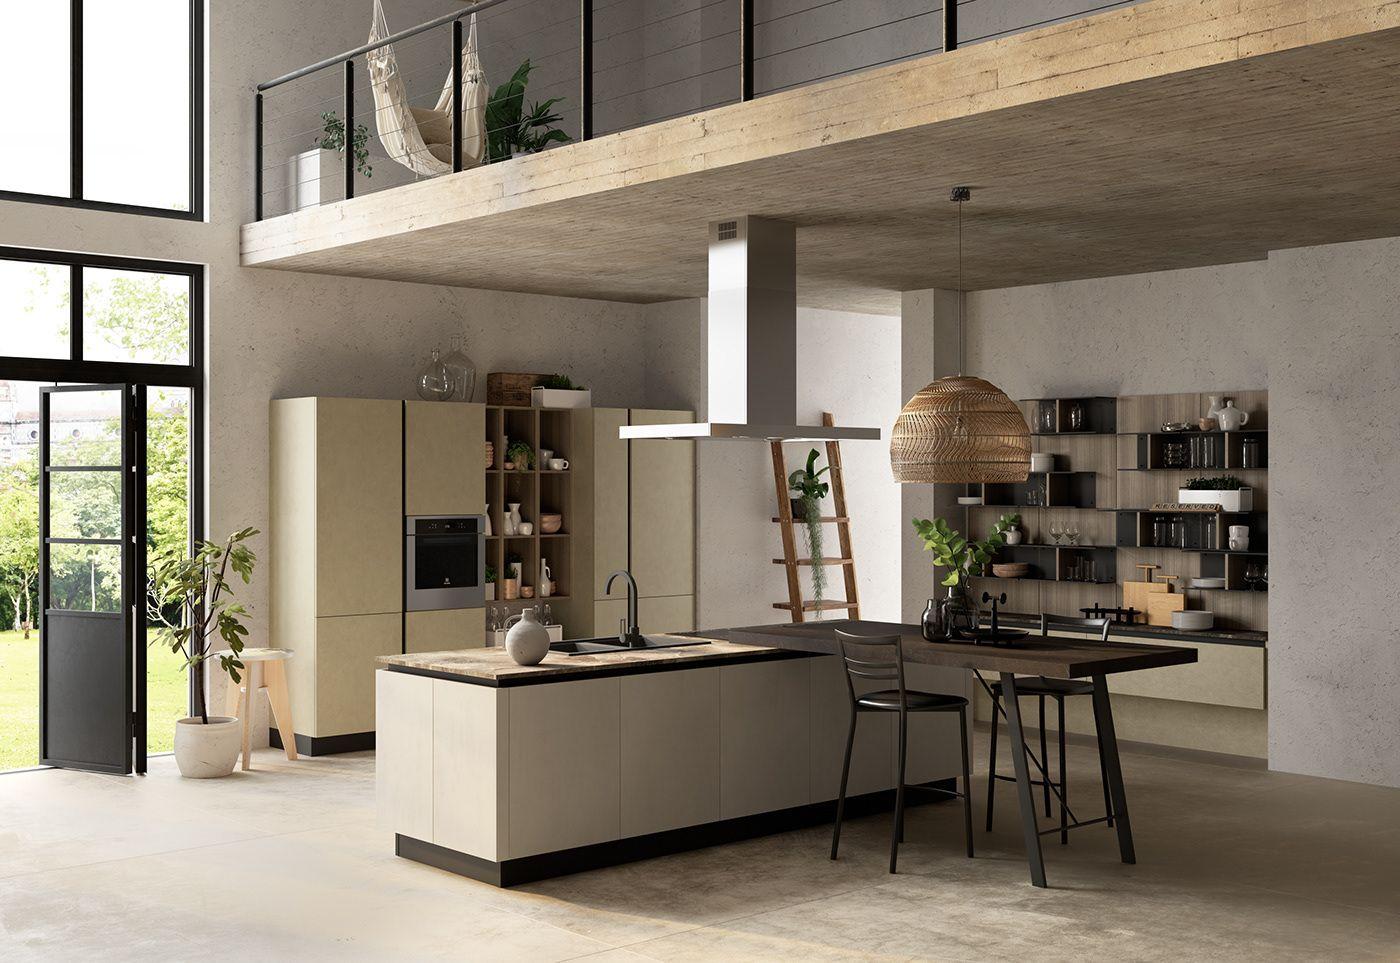 Colombini Artec Lungomare Kitchen on Behance | Kitchen ...